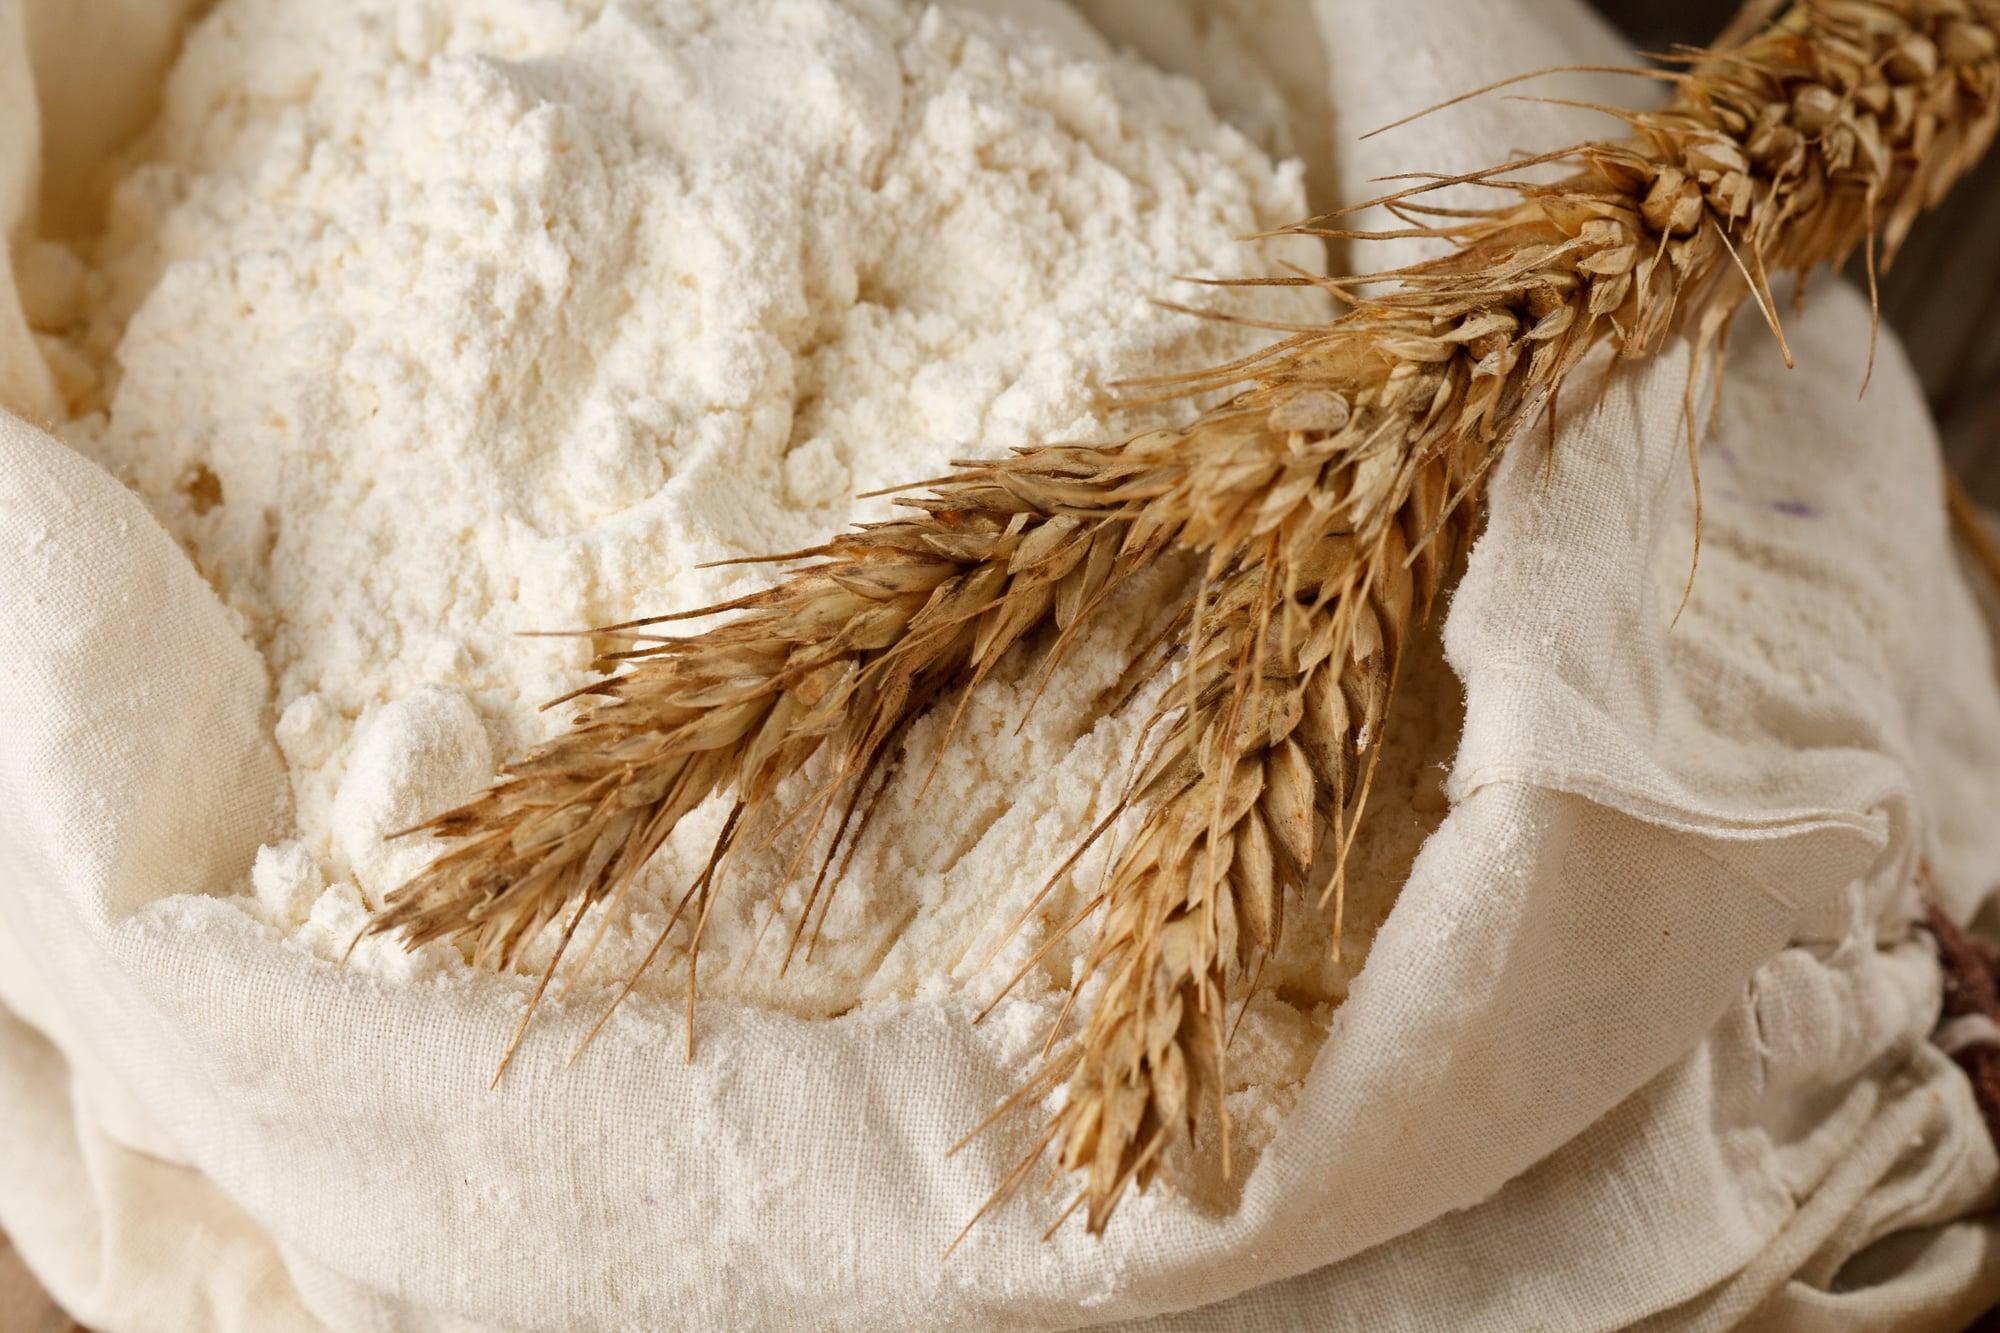 Rye flour vs wheat flour